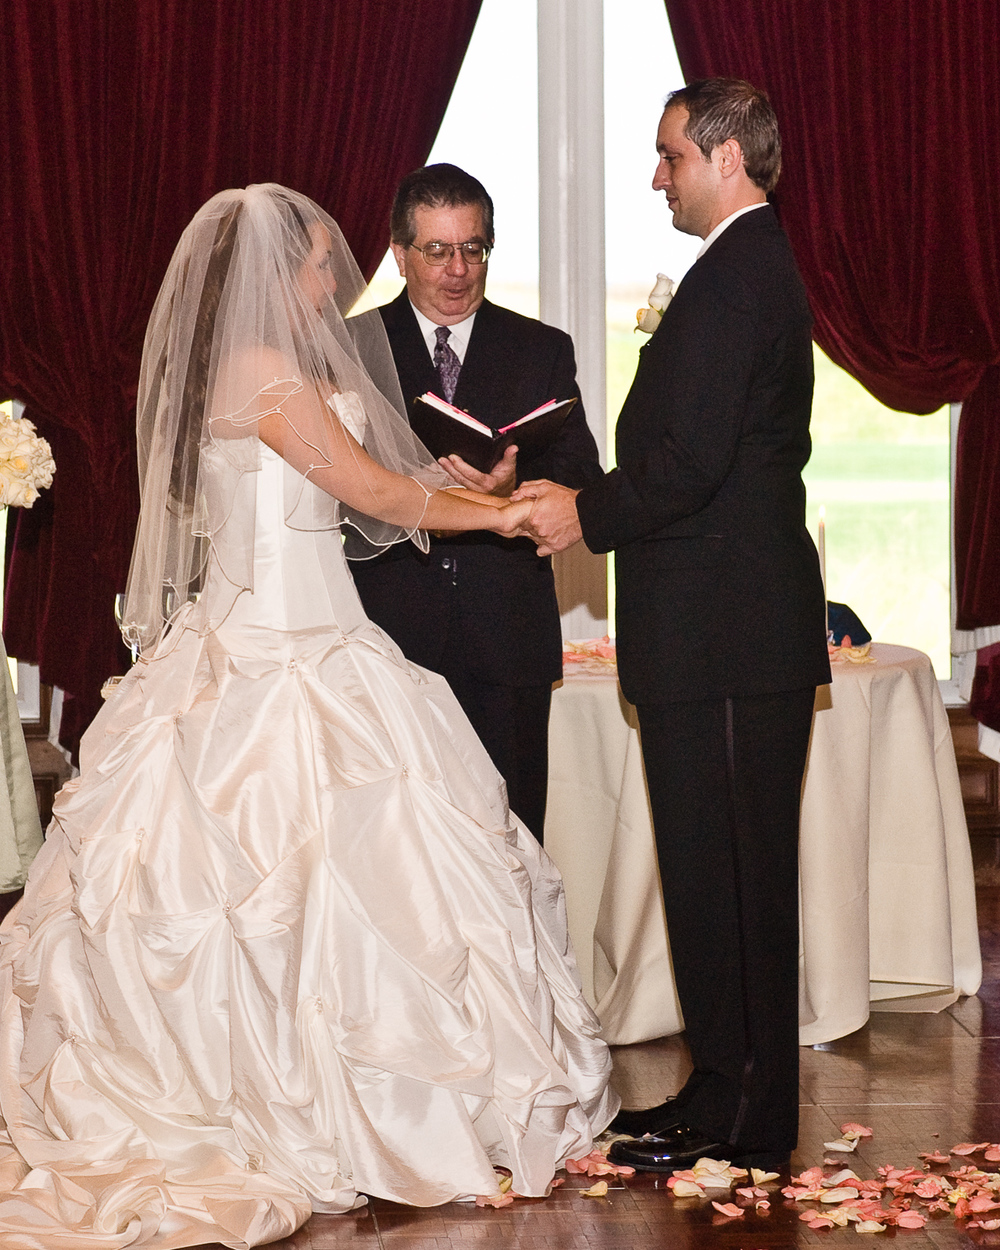 Michael-Napier-Weddings-Traylor-Cohen-Wedding-Album- (10).jpg